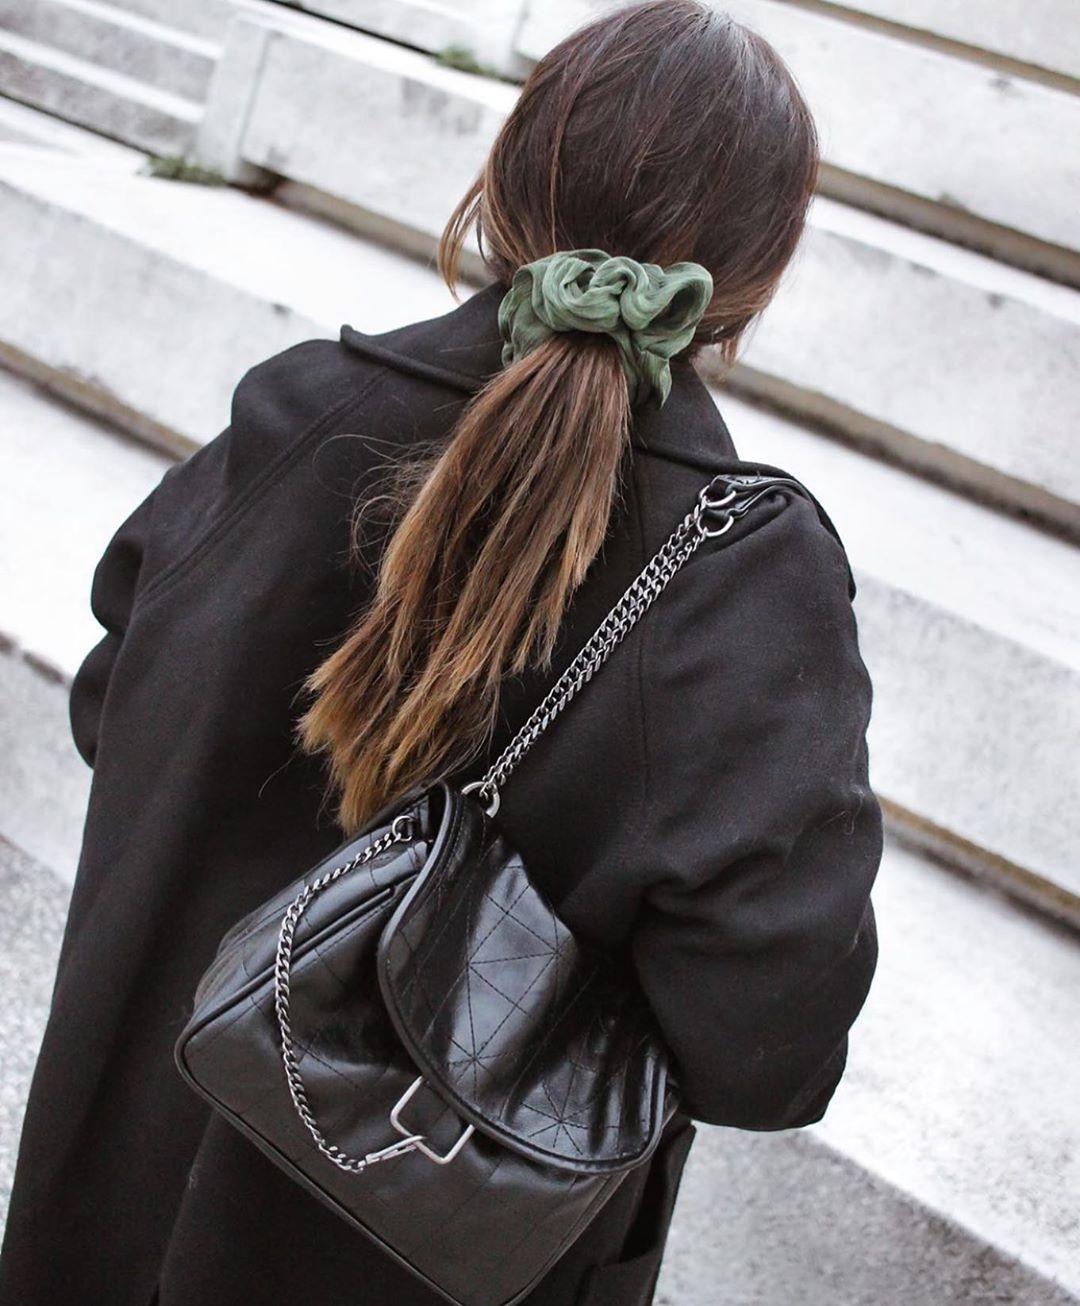 sac bandoulière soft rock de Zara sur zara.outfits